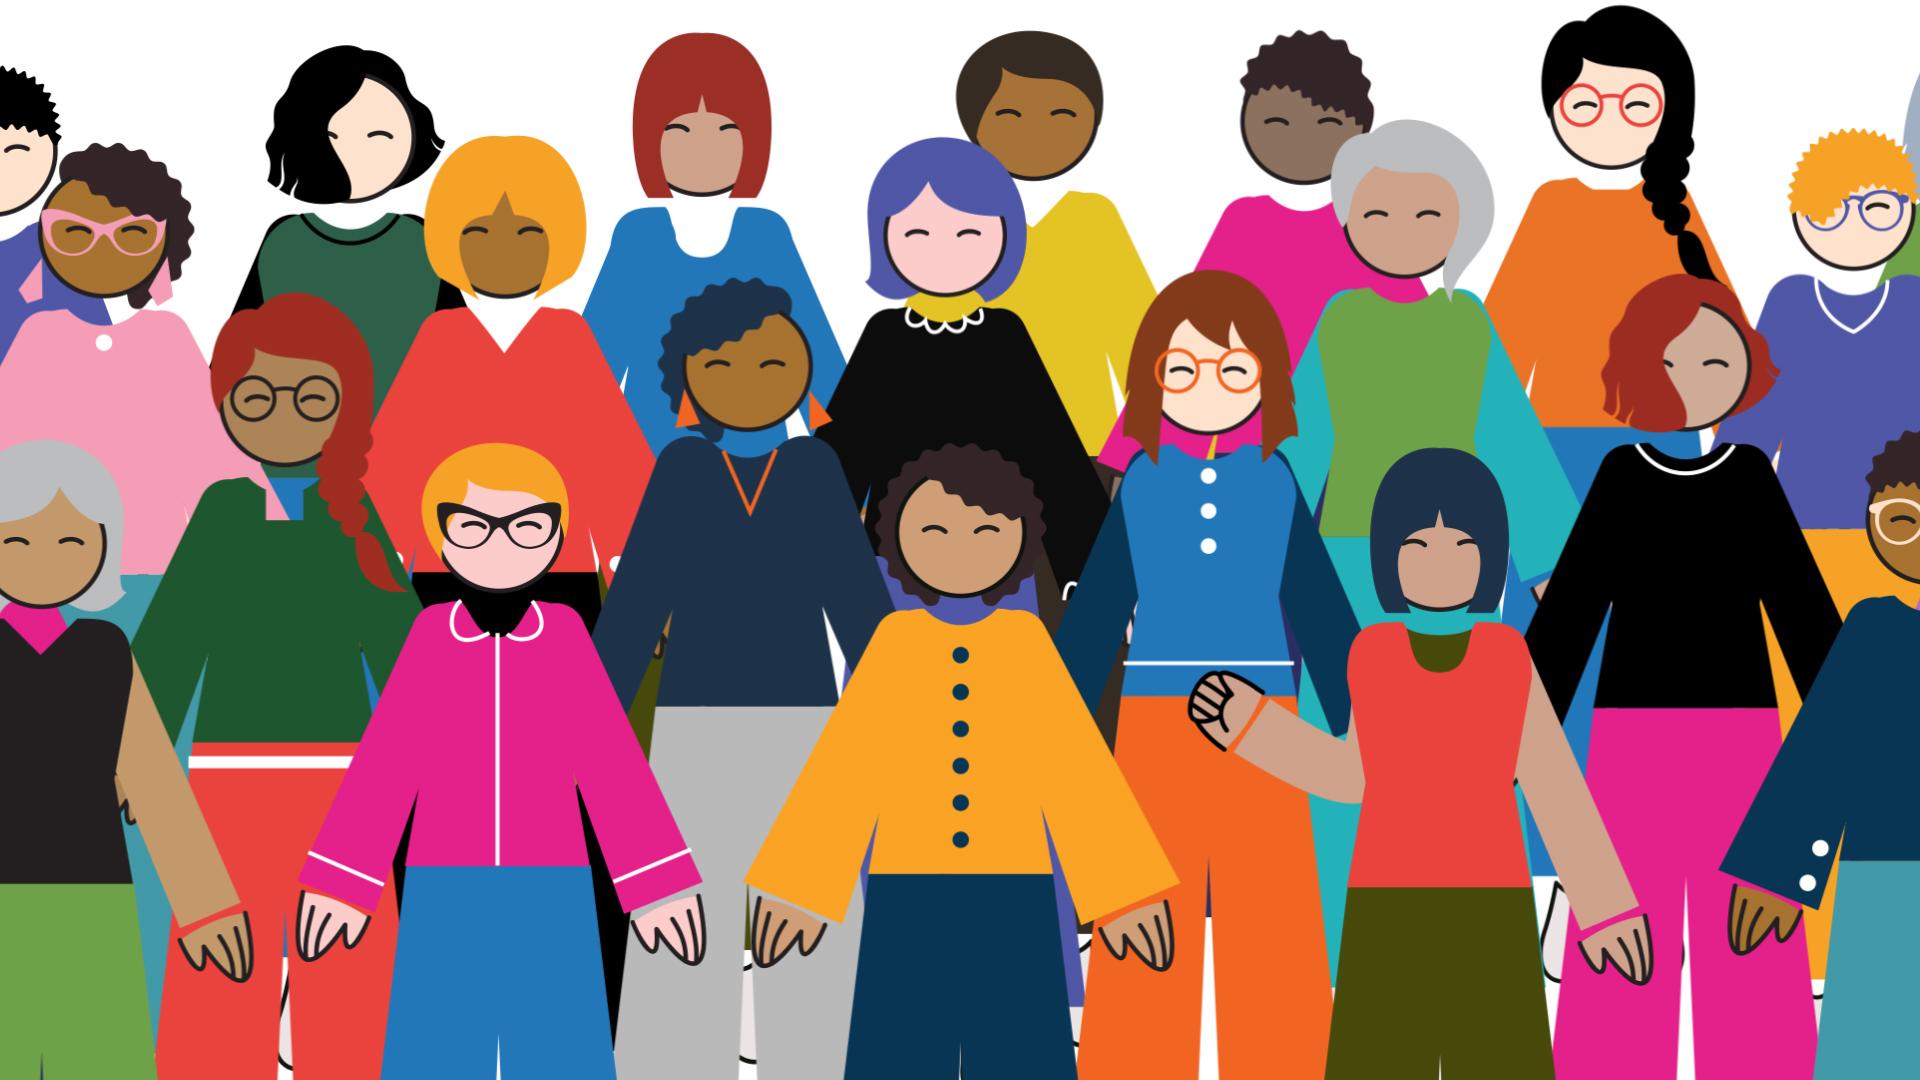 Invest in Women crowd of women